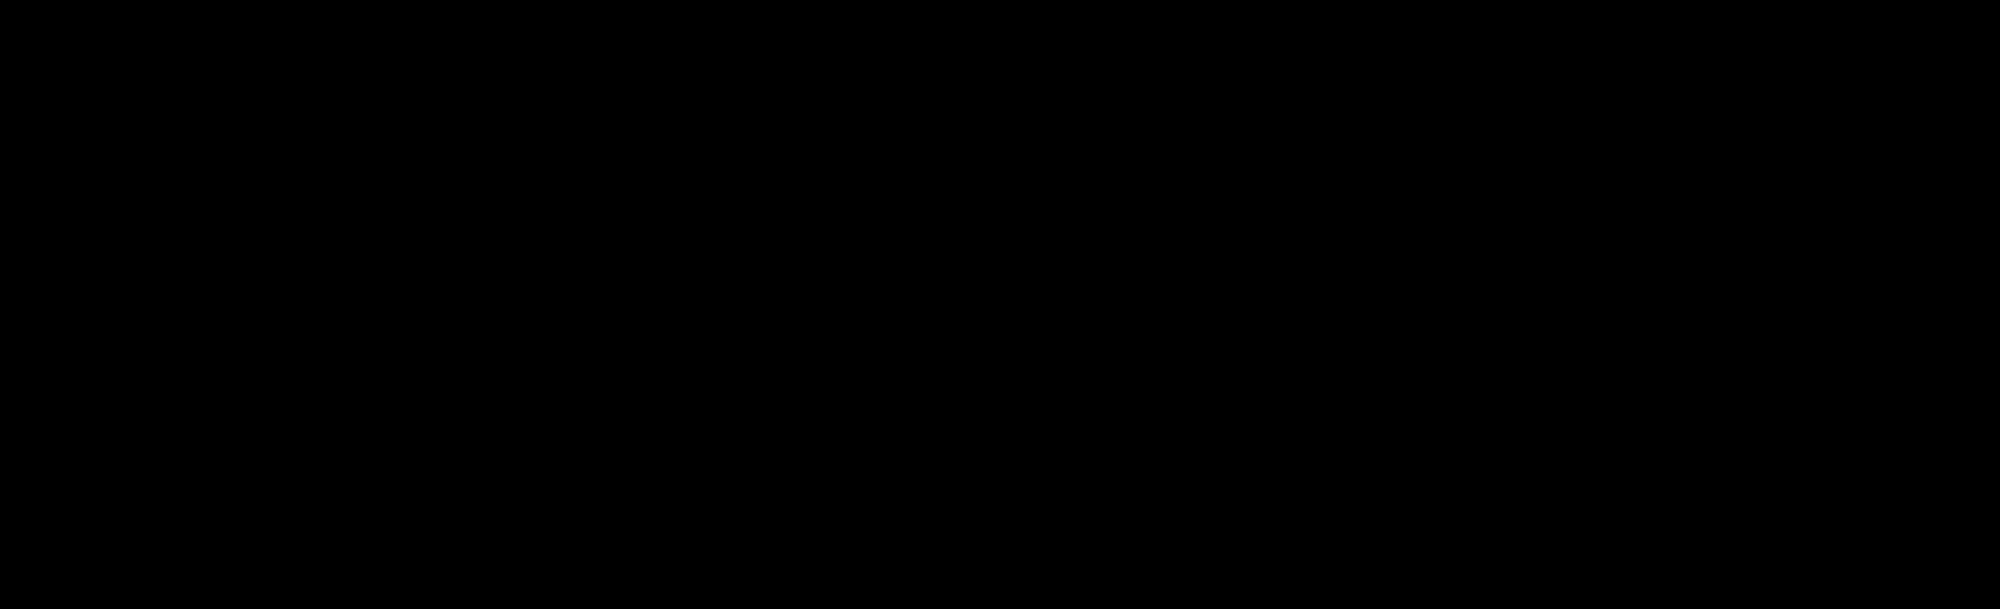 CBS Network logo